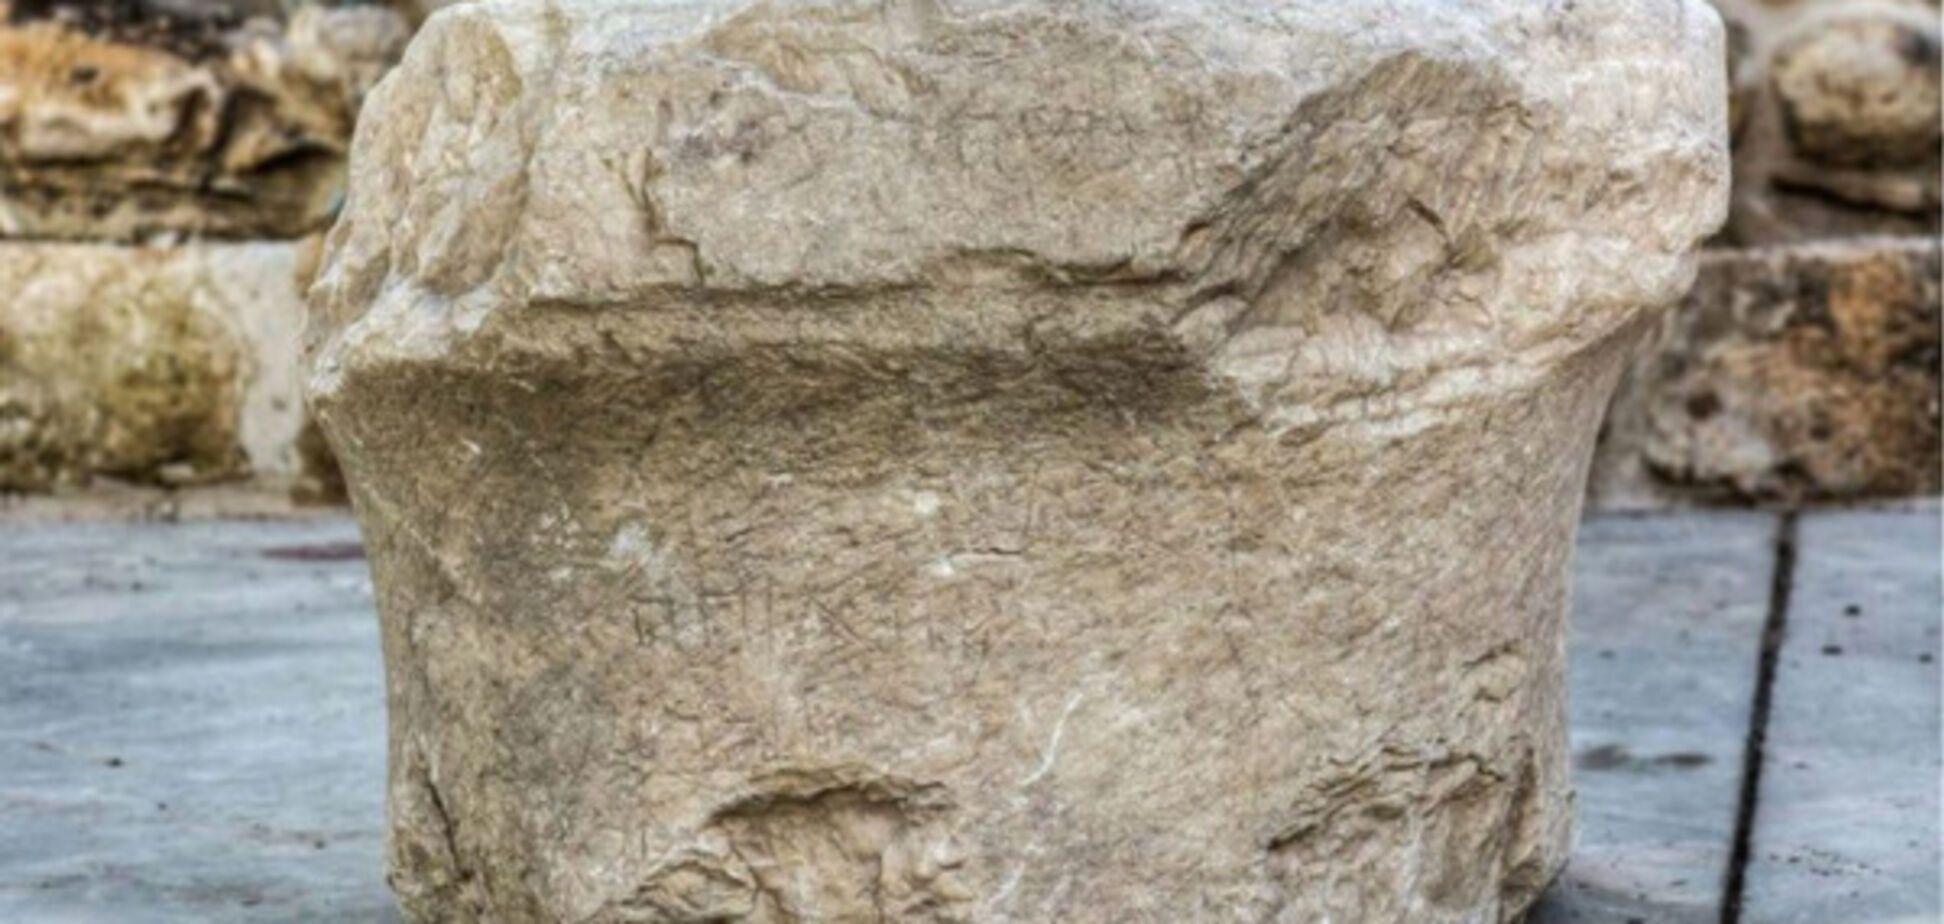 камень с древними надписями на иврите